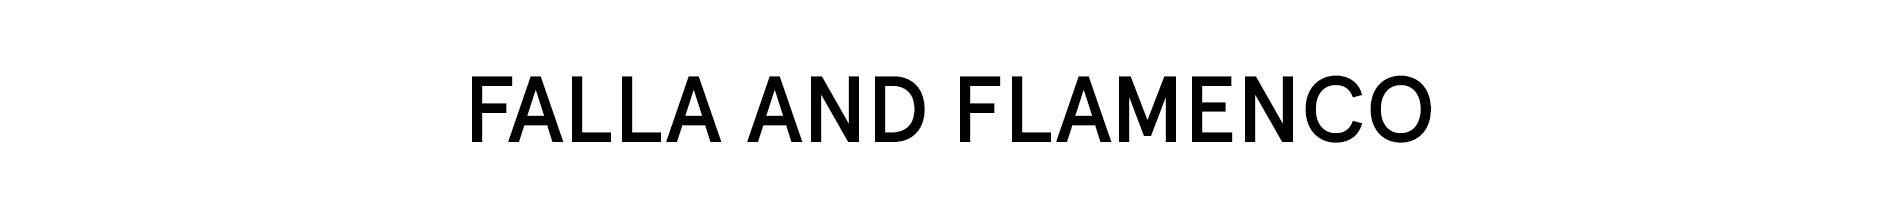 Falla and Flamenco